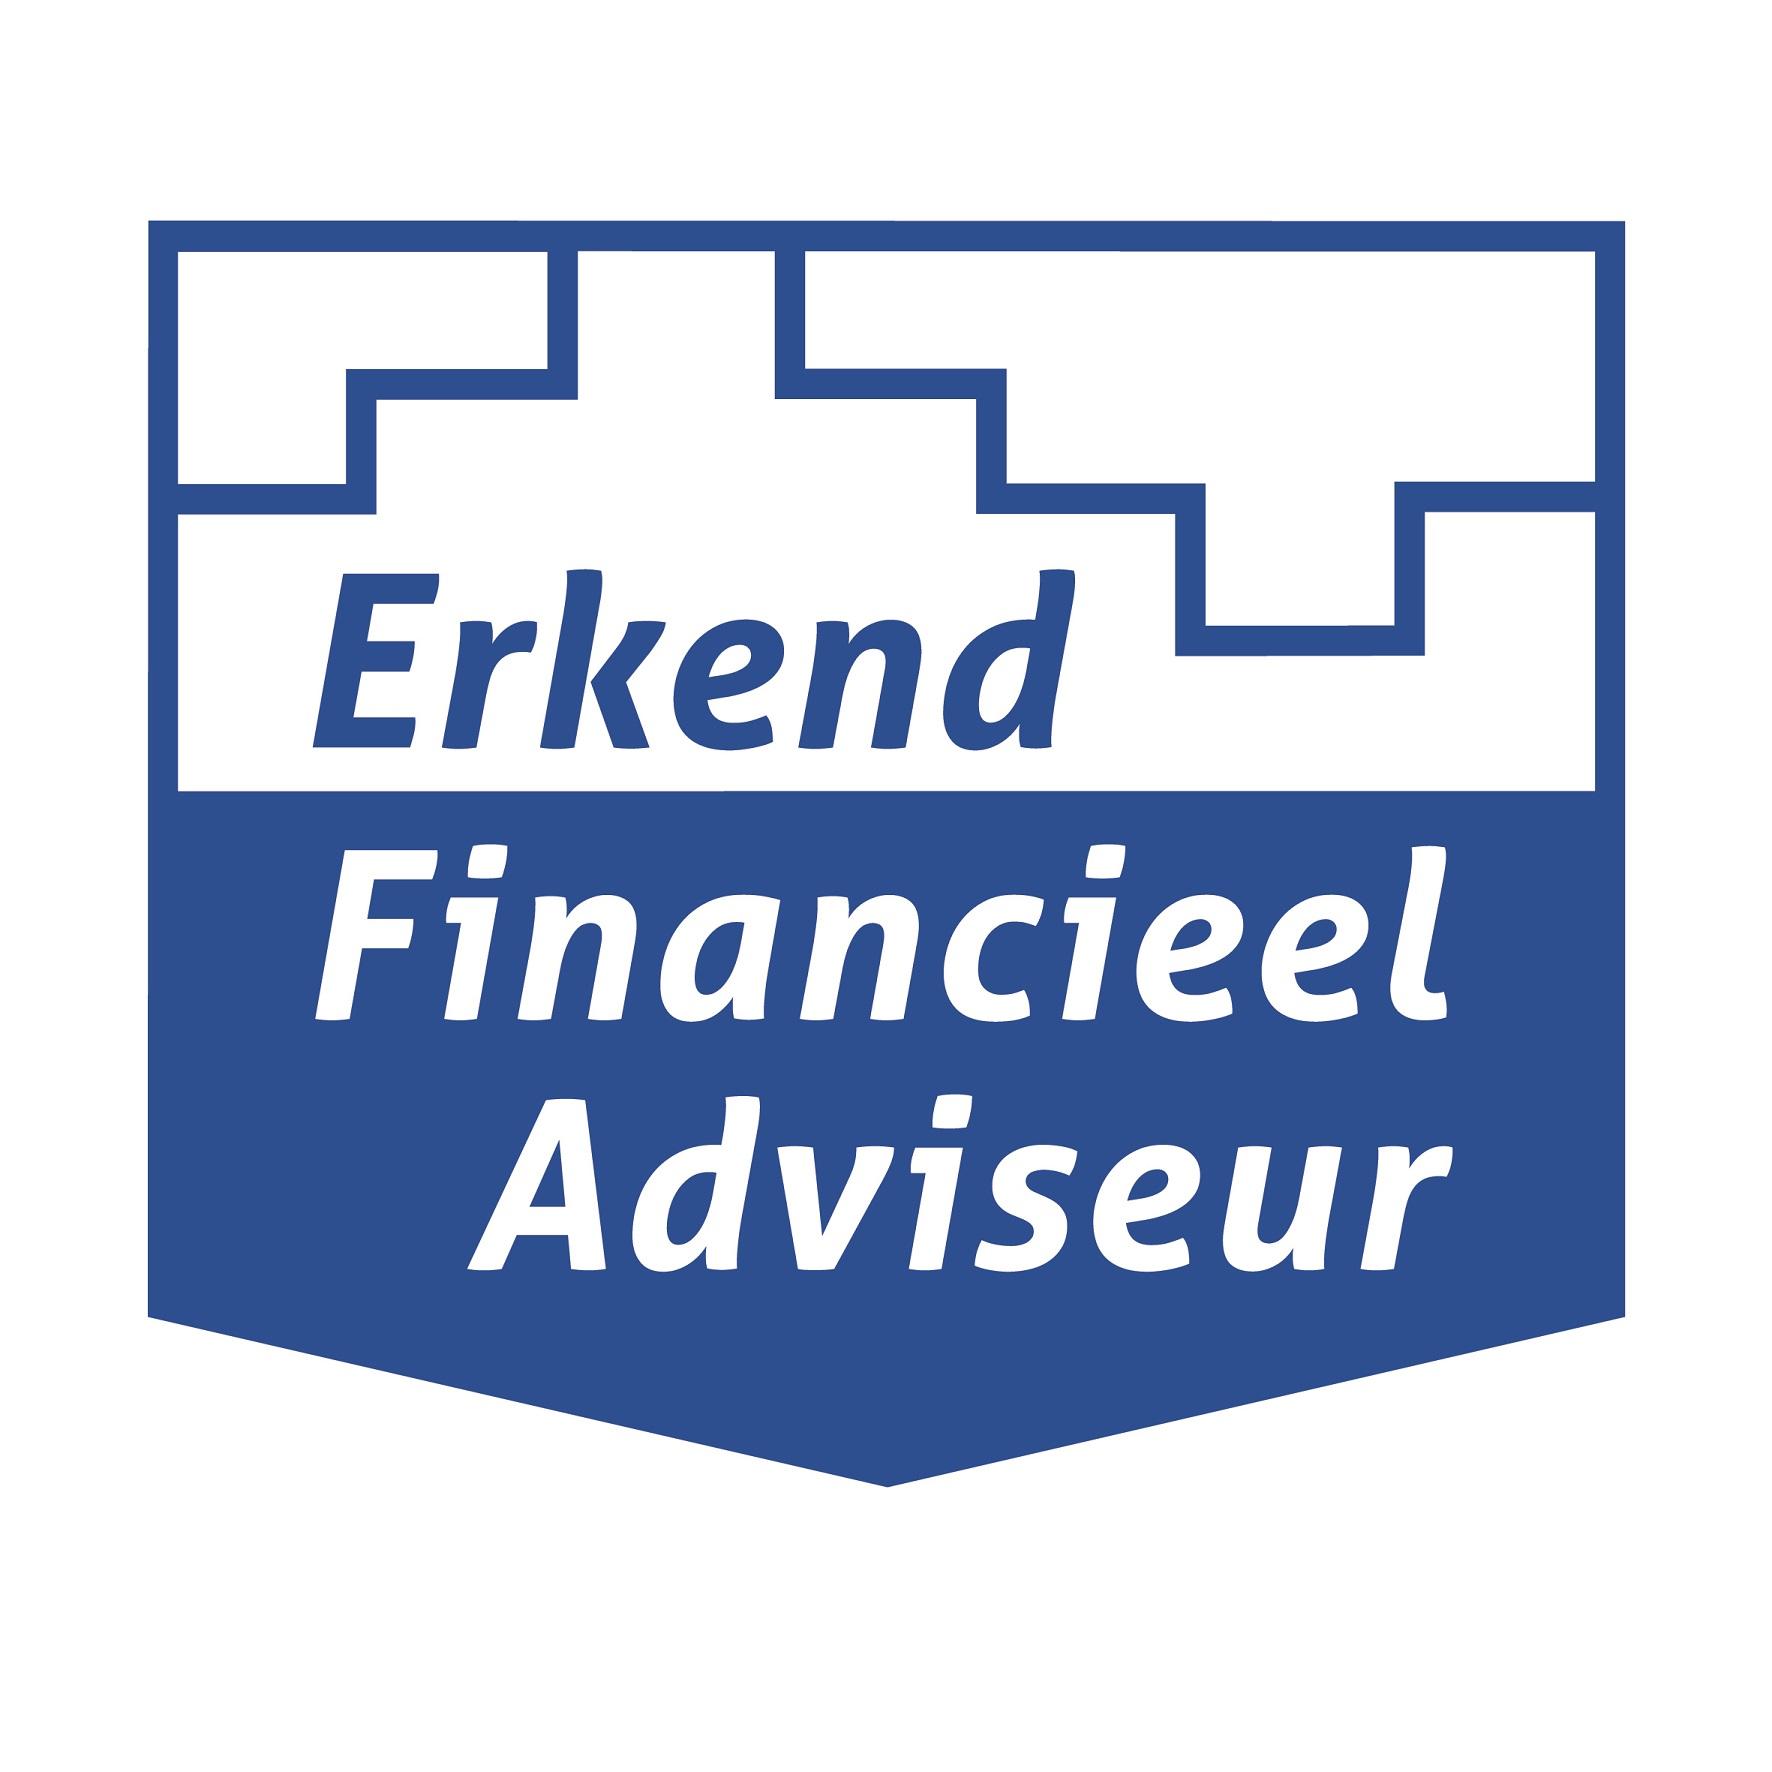 Erkend Financieel Adviseur klein